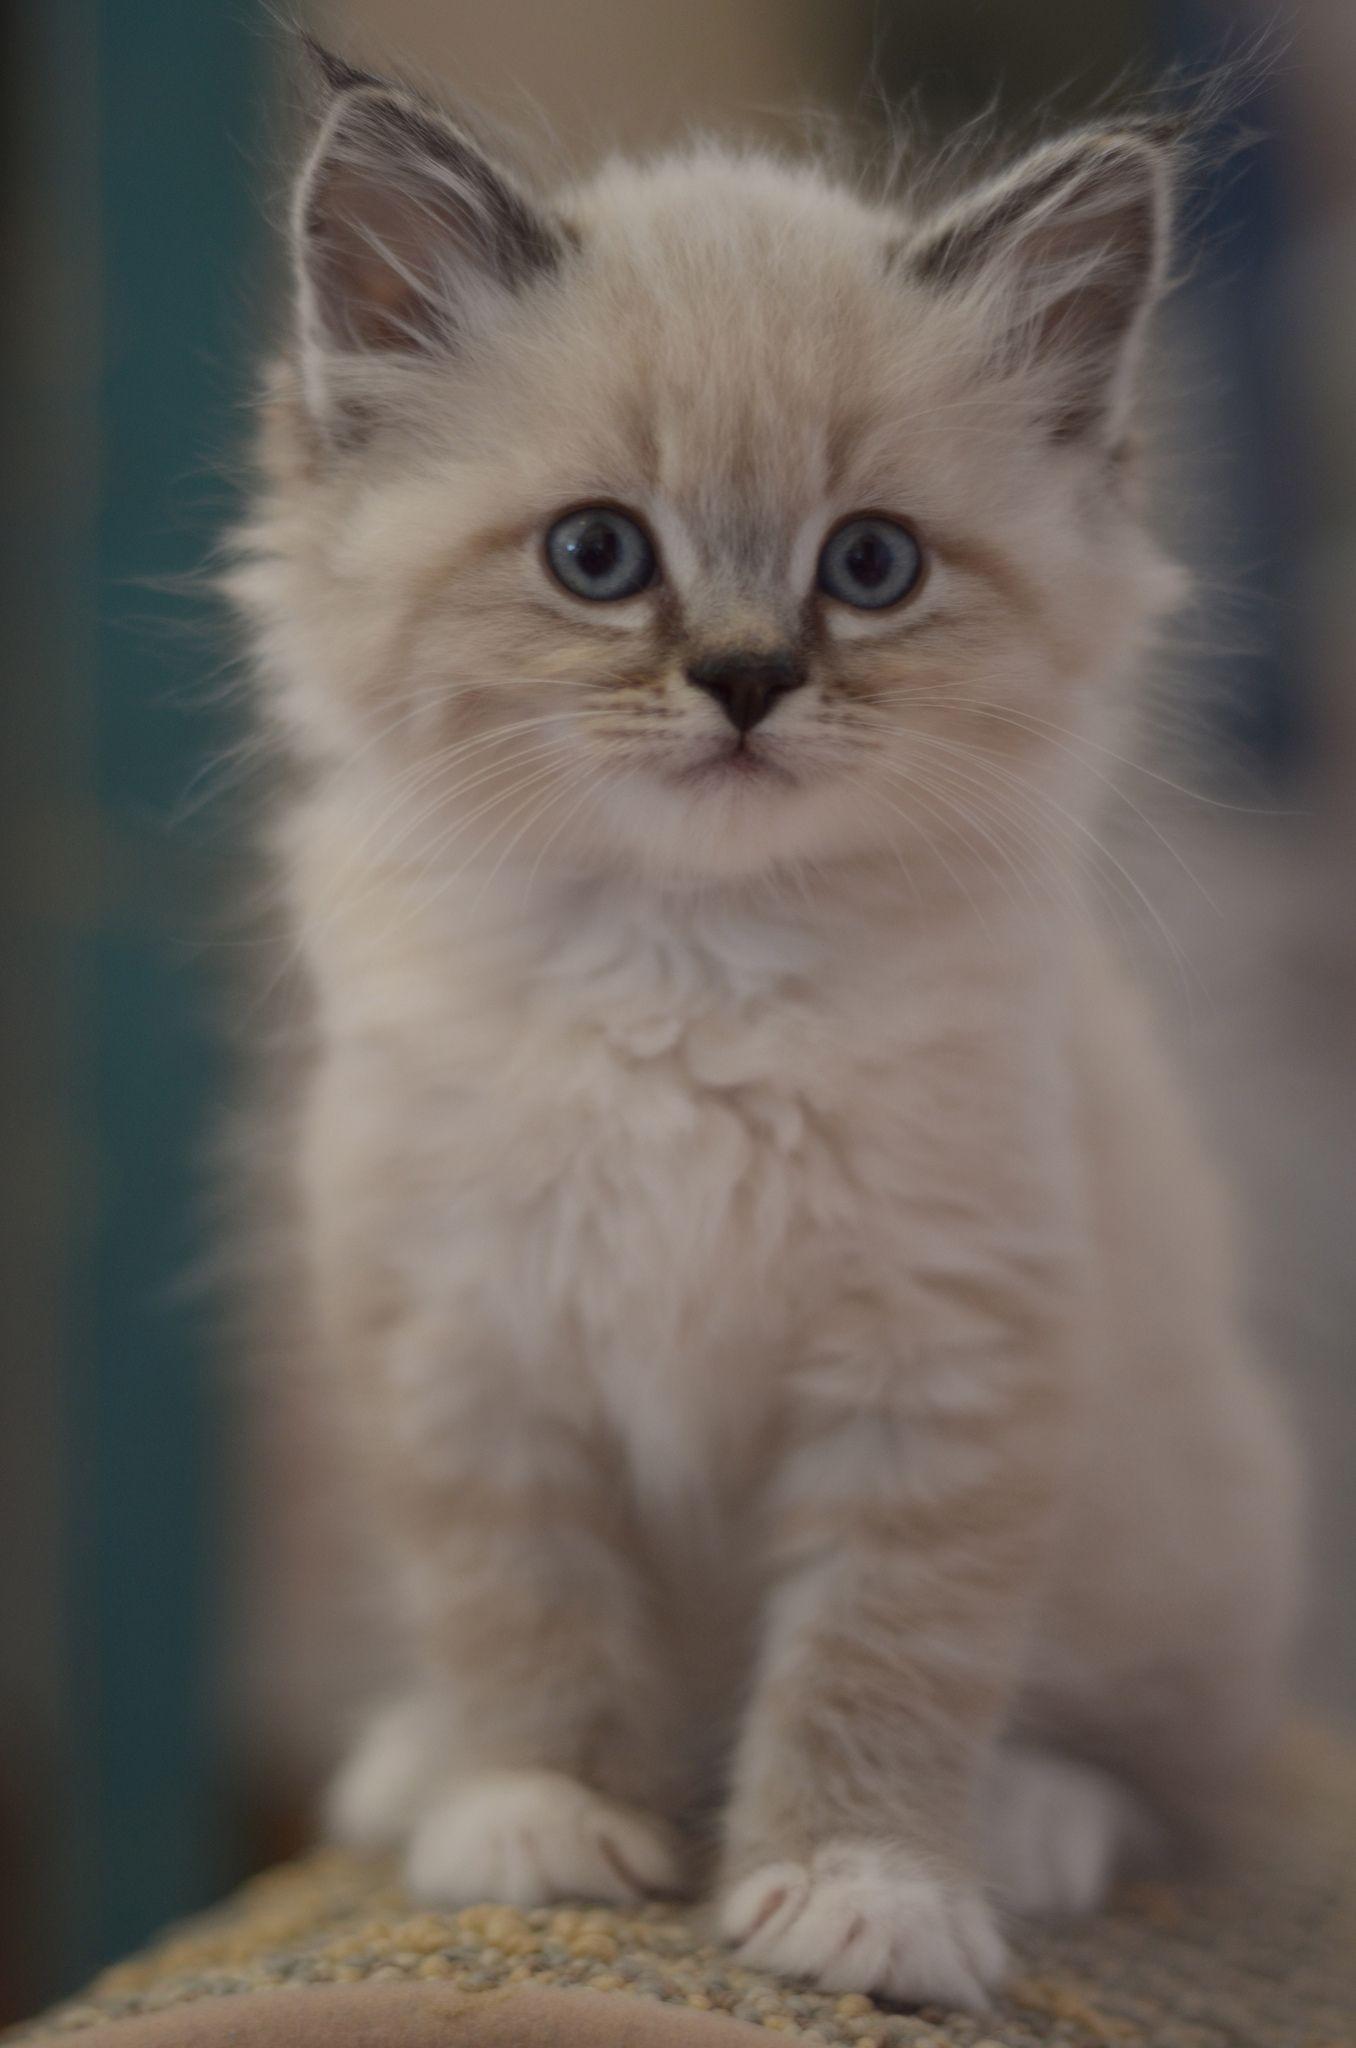 Dsc 0061 Kittens Cutest Cute Fluffy Kittens Cute Cats